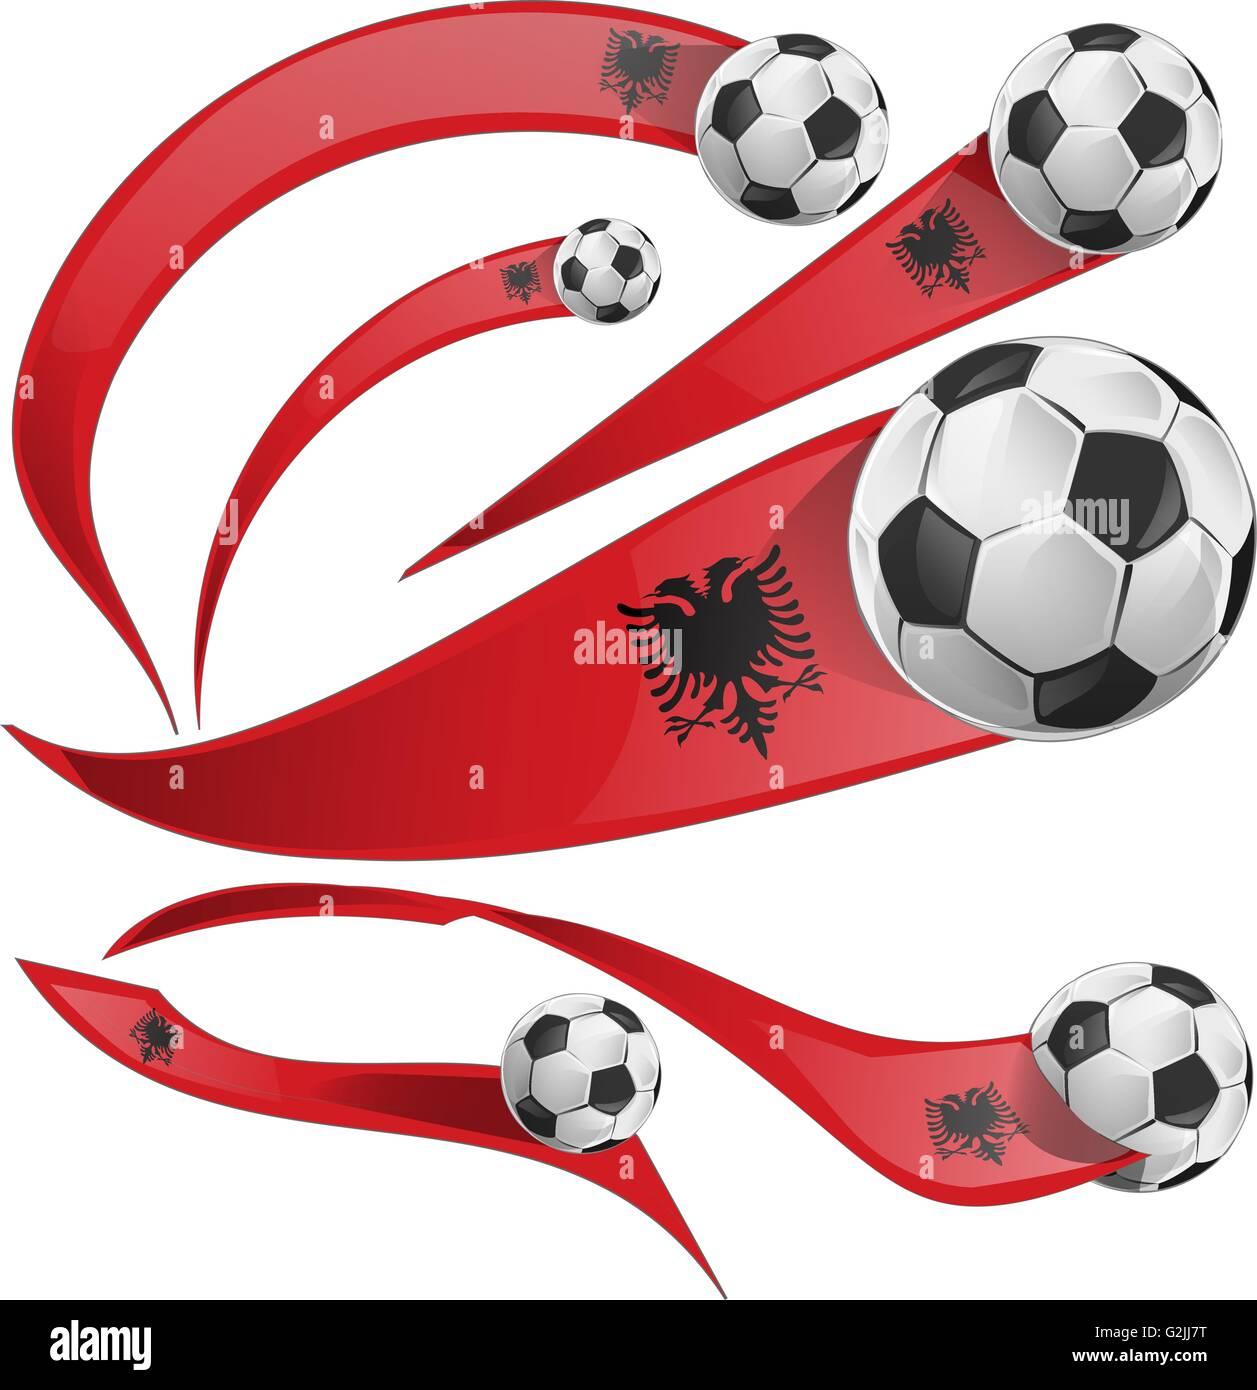 albania flag set with soccer ball isolated - Stock Vector